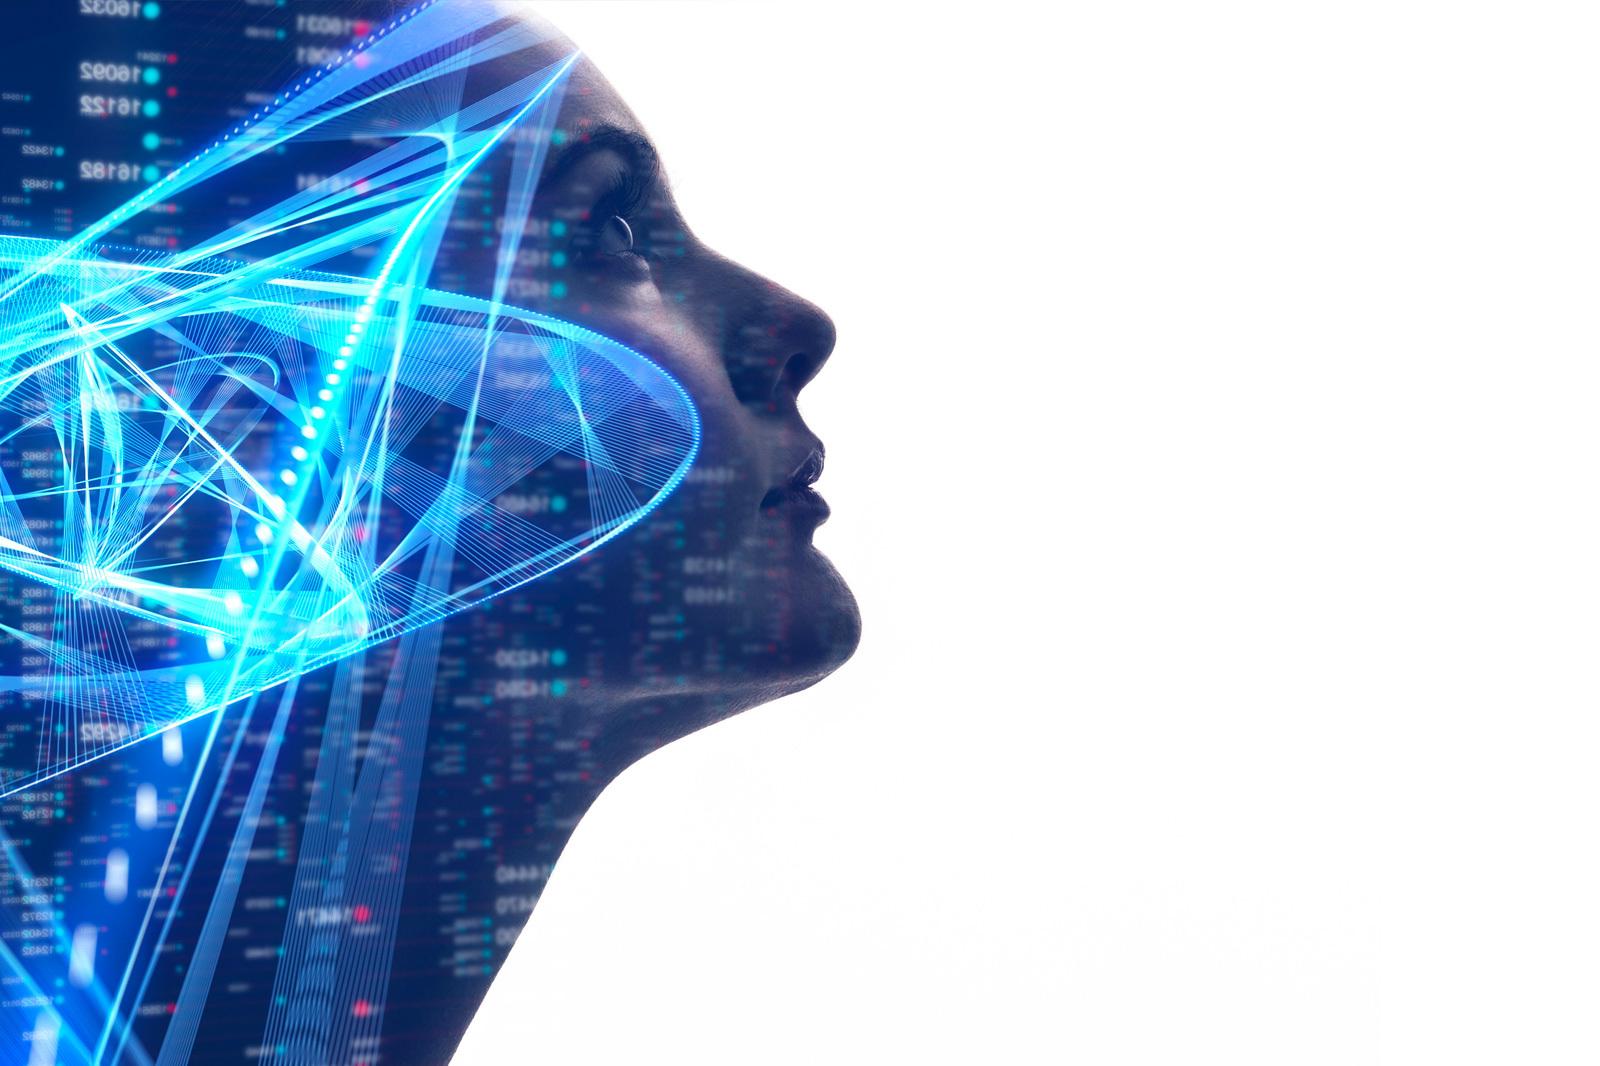 Applied AI and Deep Learning - Microsoft Azure AI Certification - FutureLearn